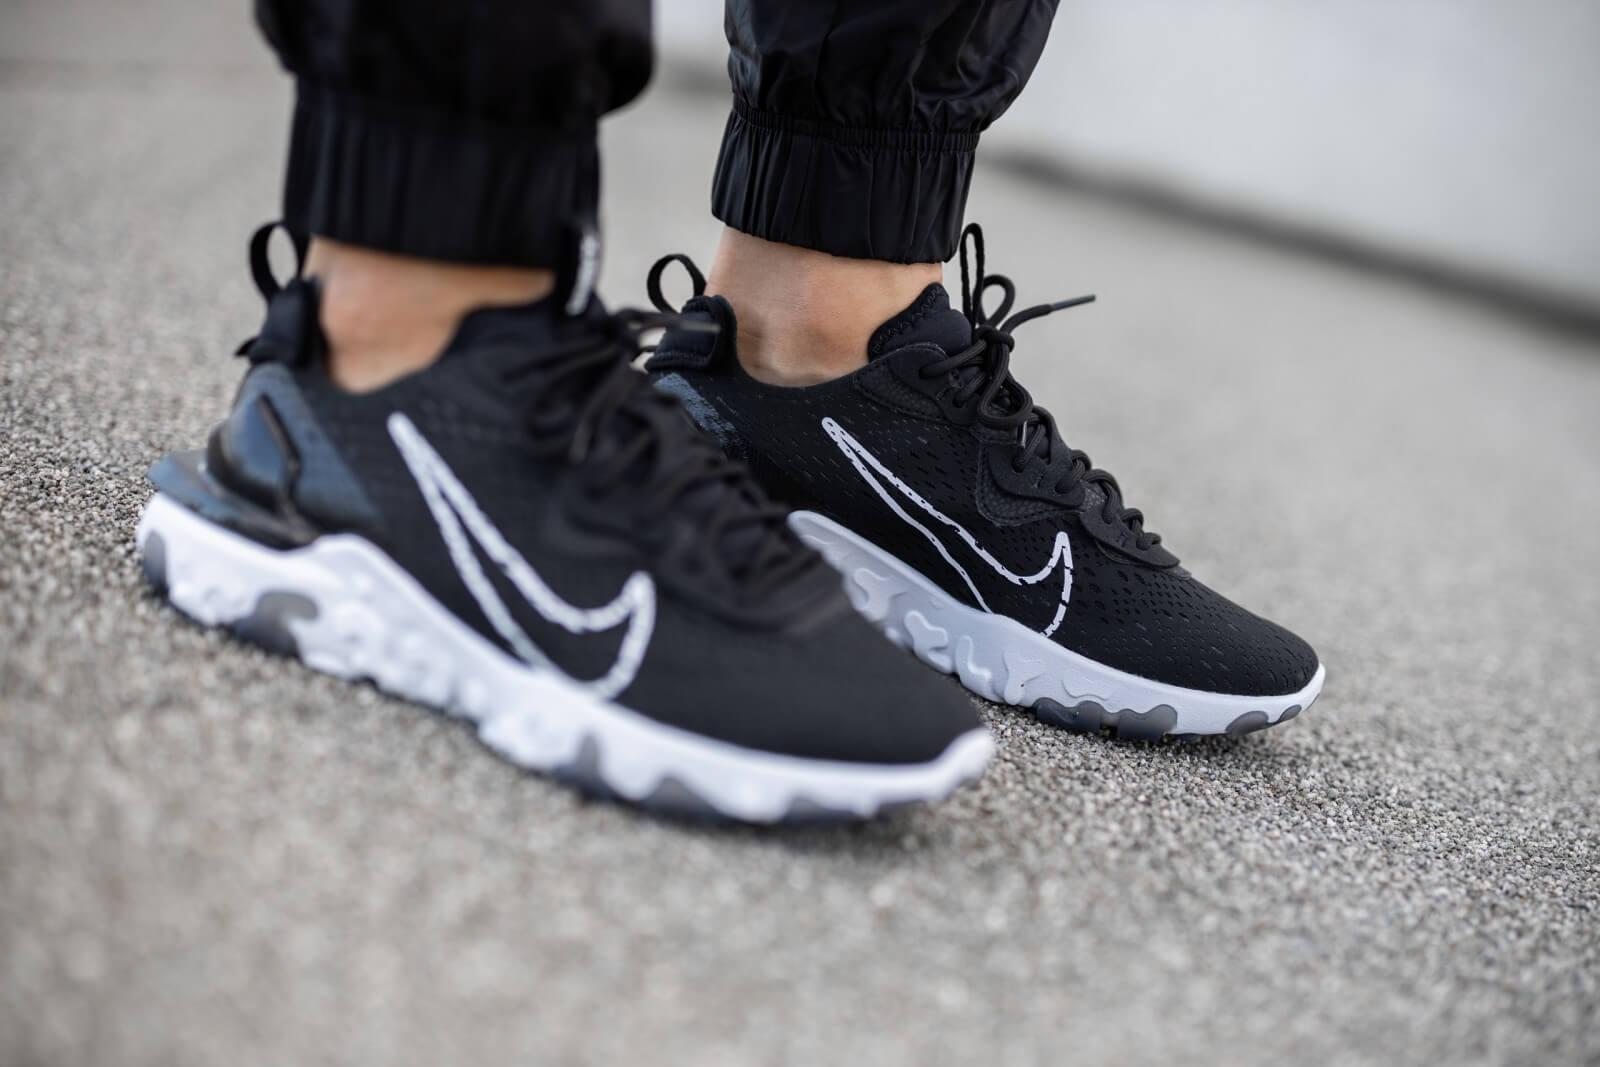 Nike React Vision Black/White-Black